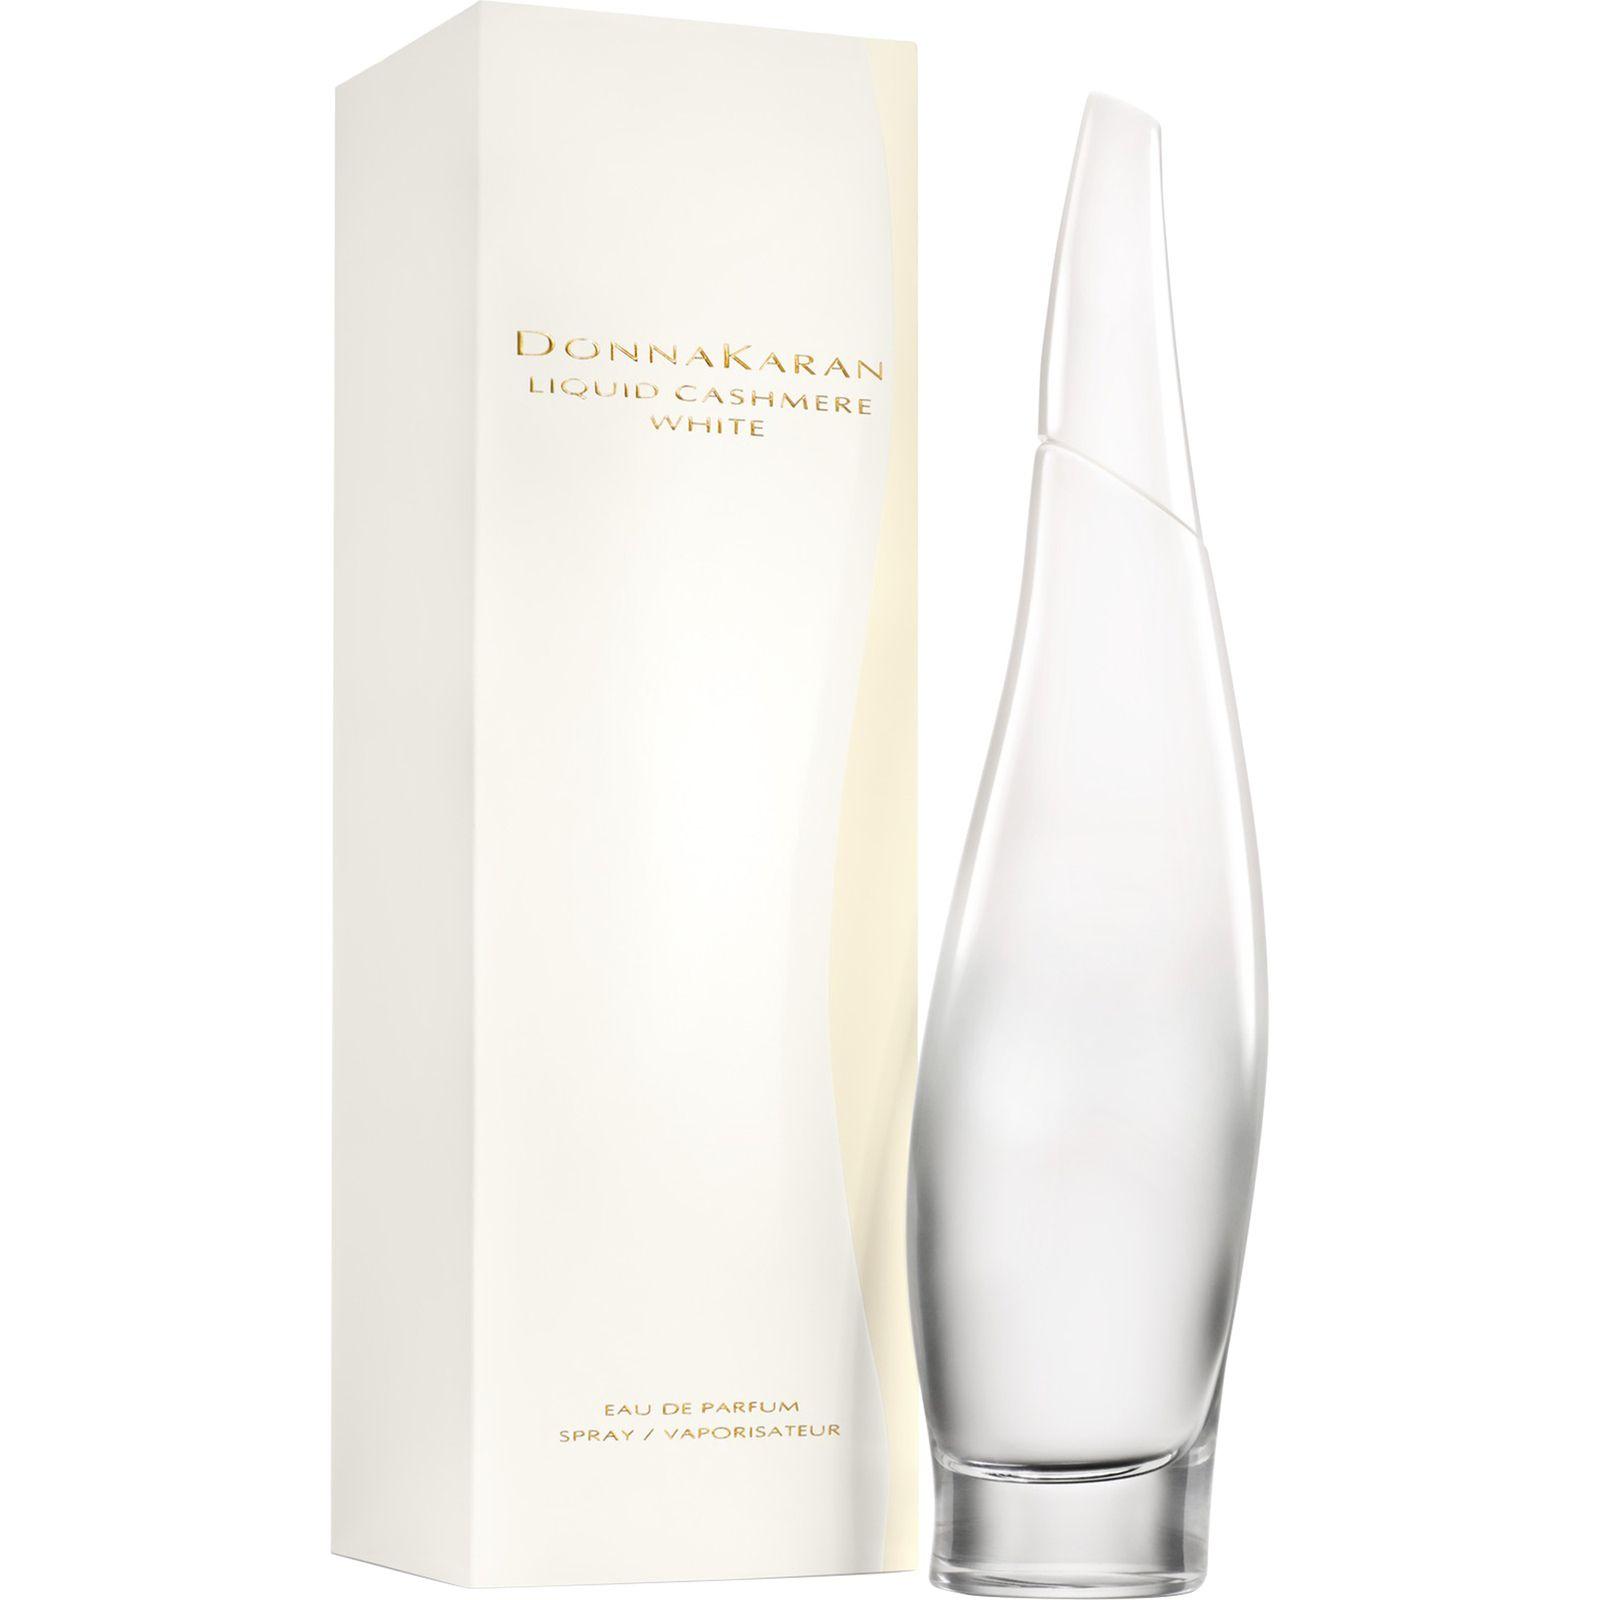 Donna Karan, Liquid Cashmere White edp